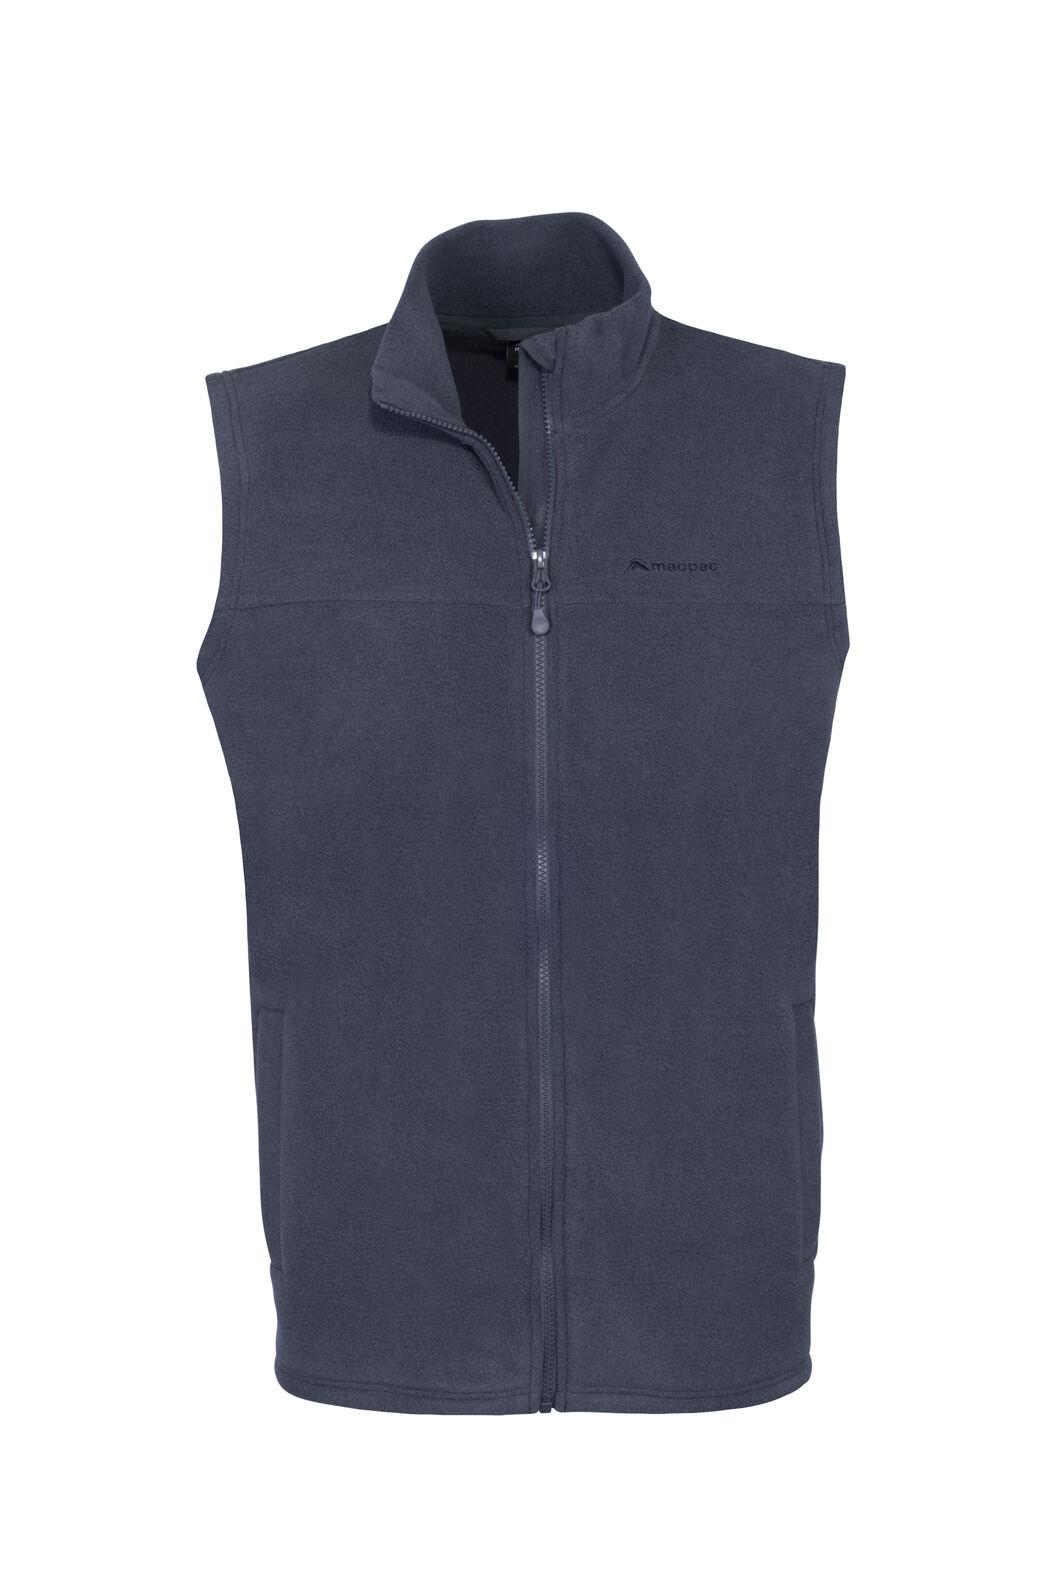 Macpac Waitomo Polartec® Fleece Vest — Men's, India Ink, hi-res